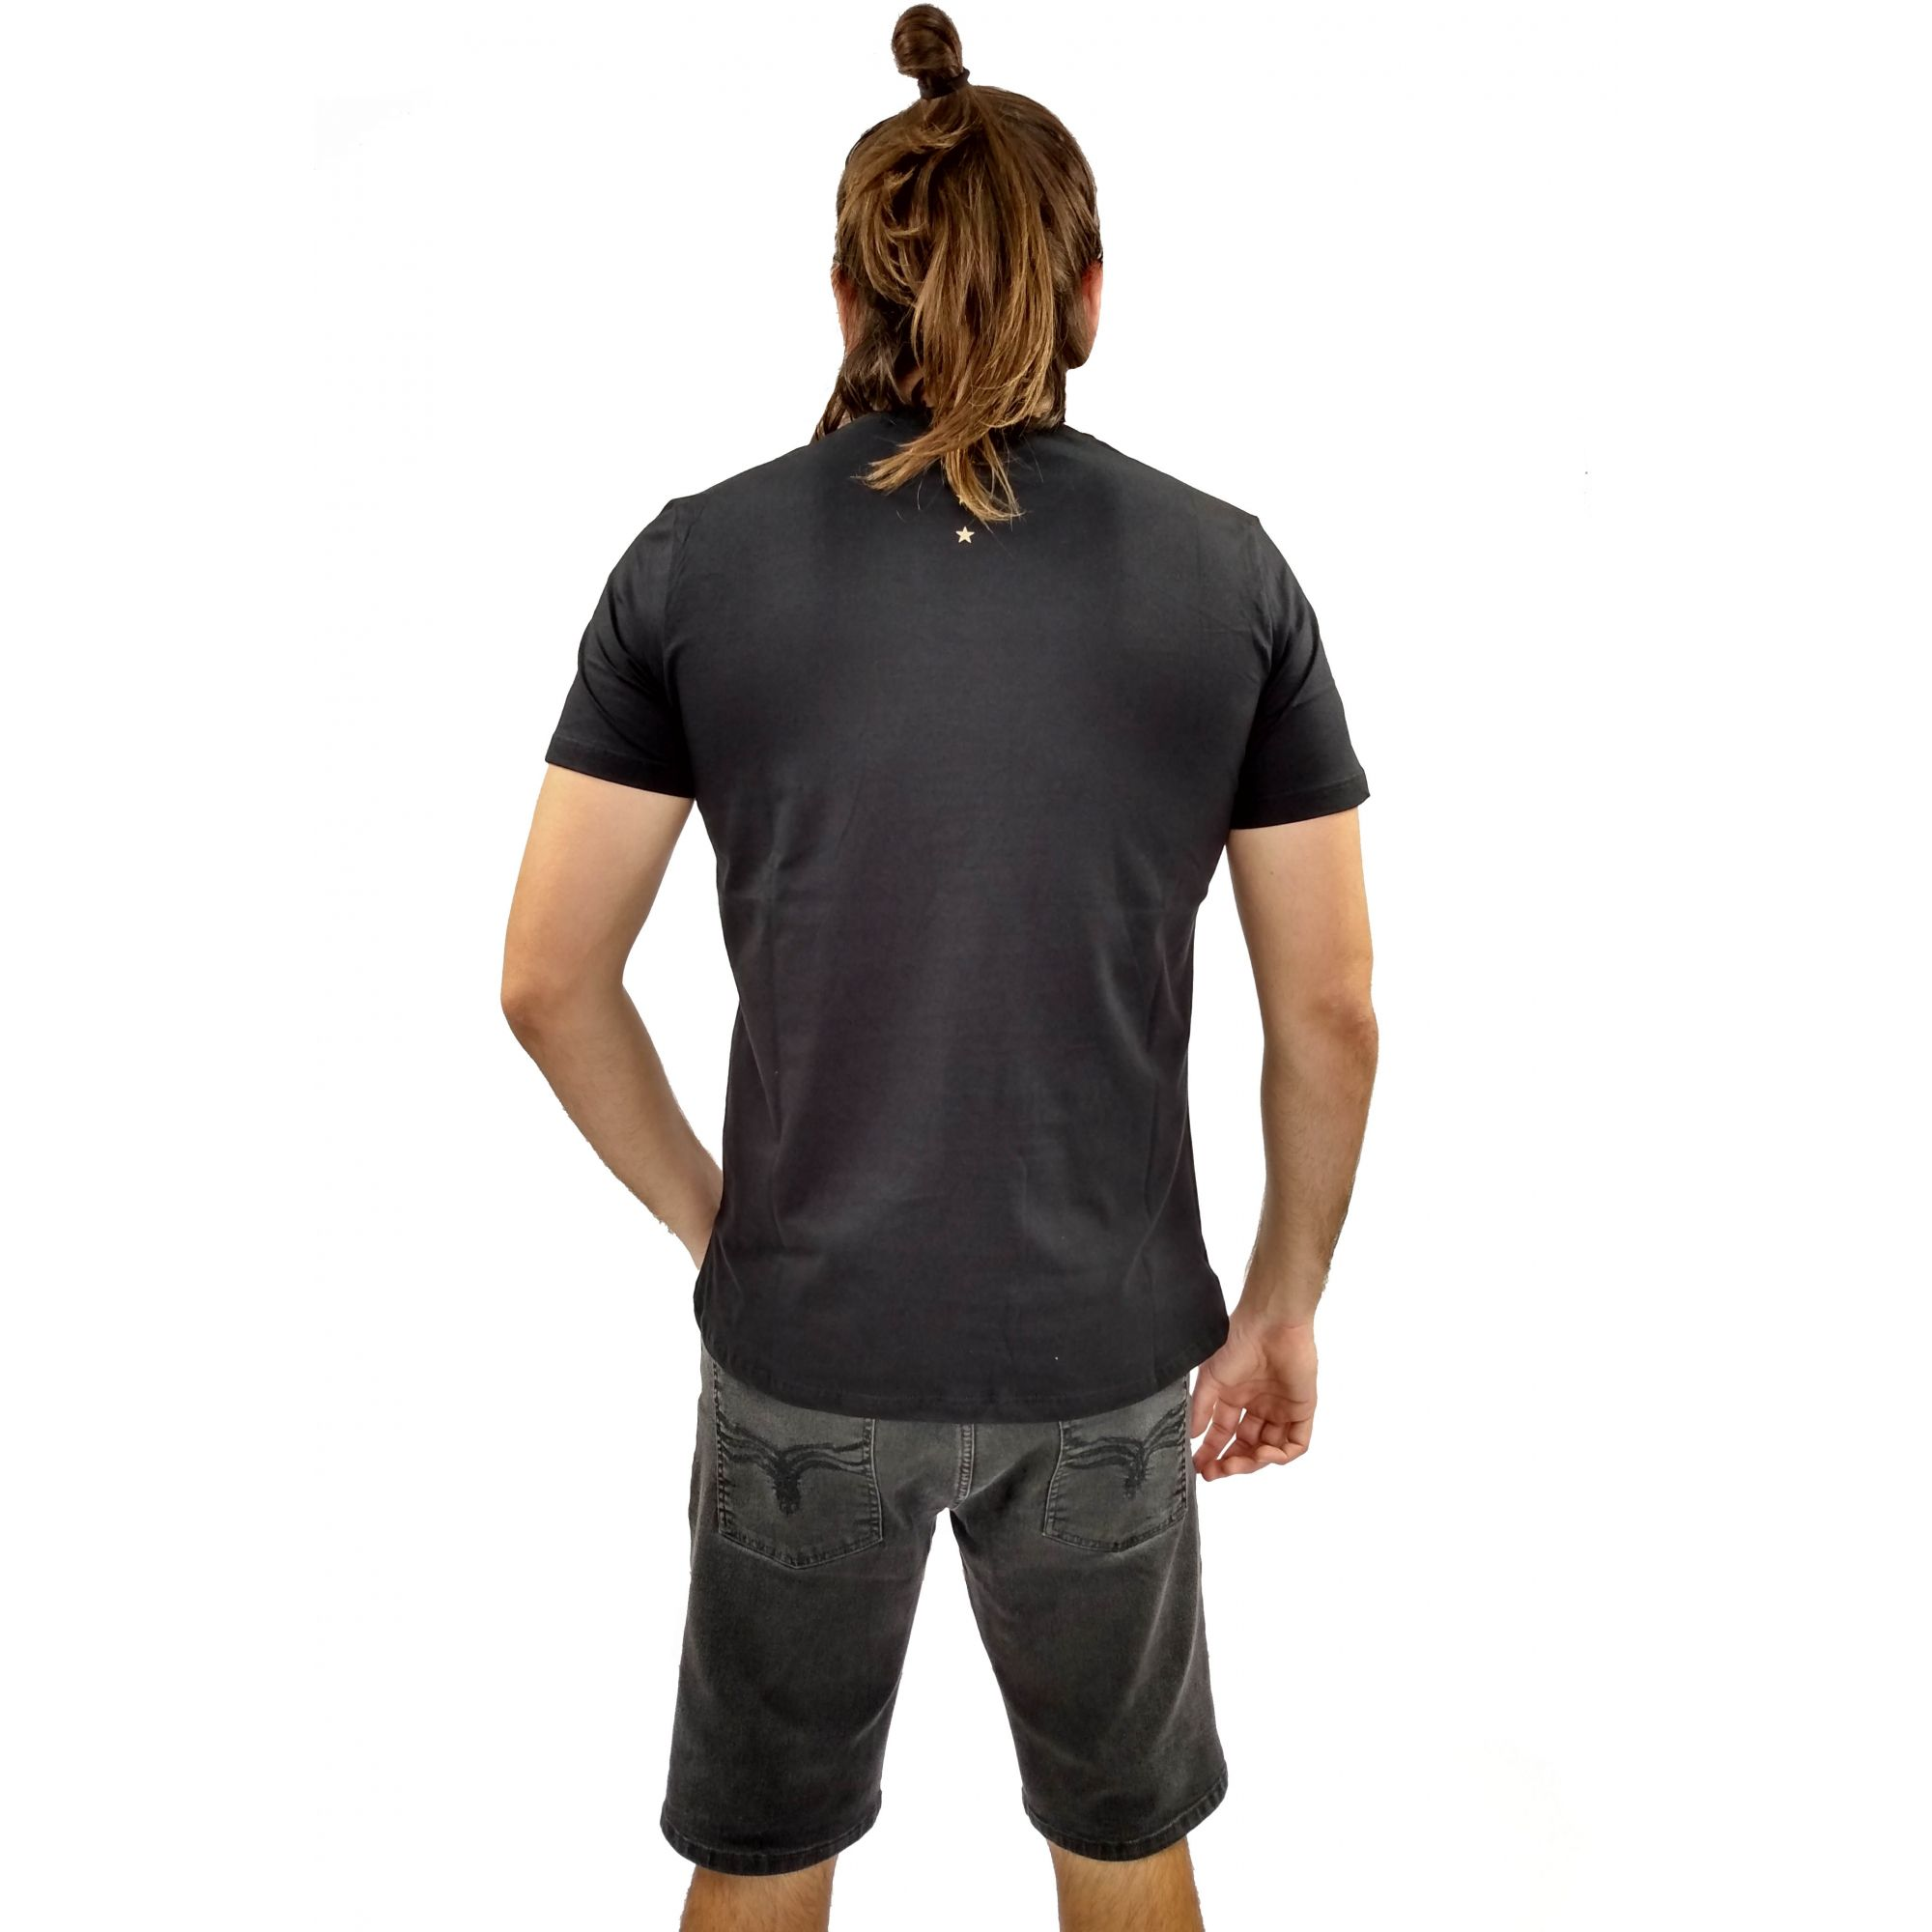 Camiseta Acostamento Masculina Nirvana Unplugged Preto